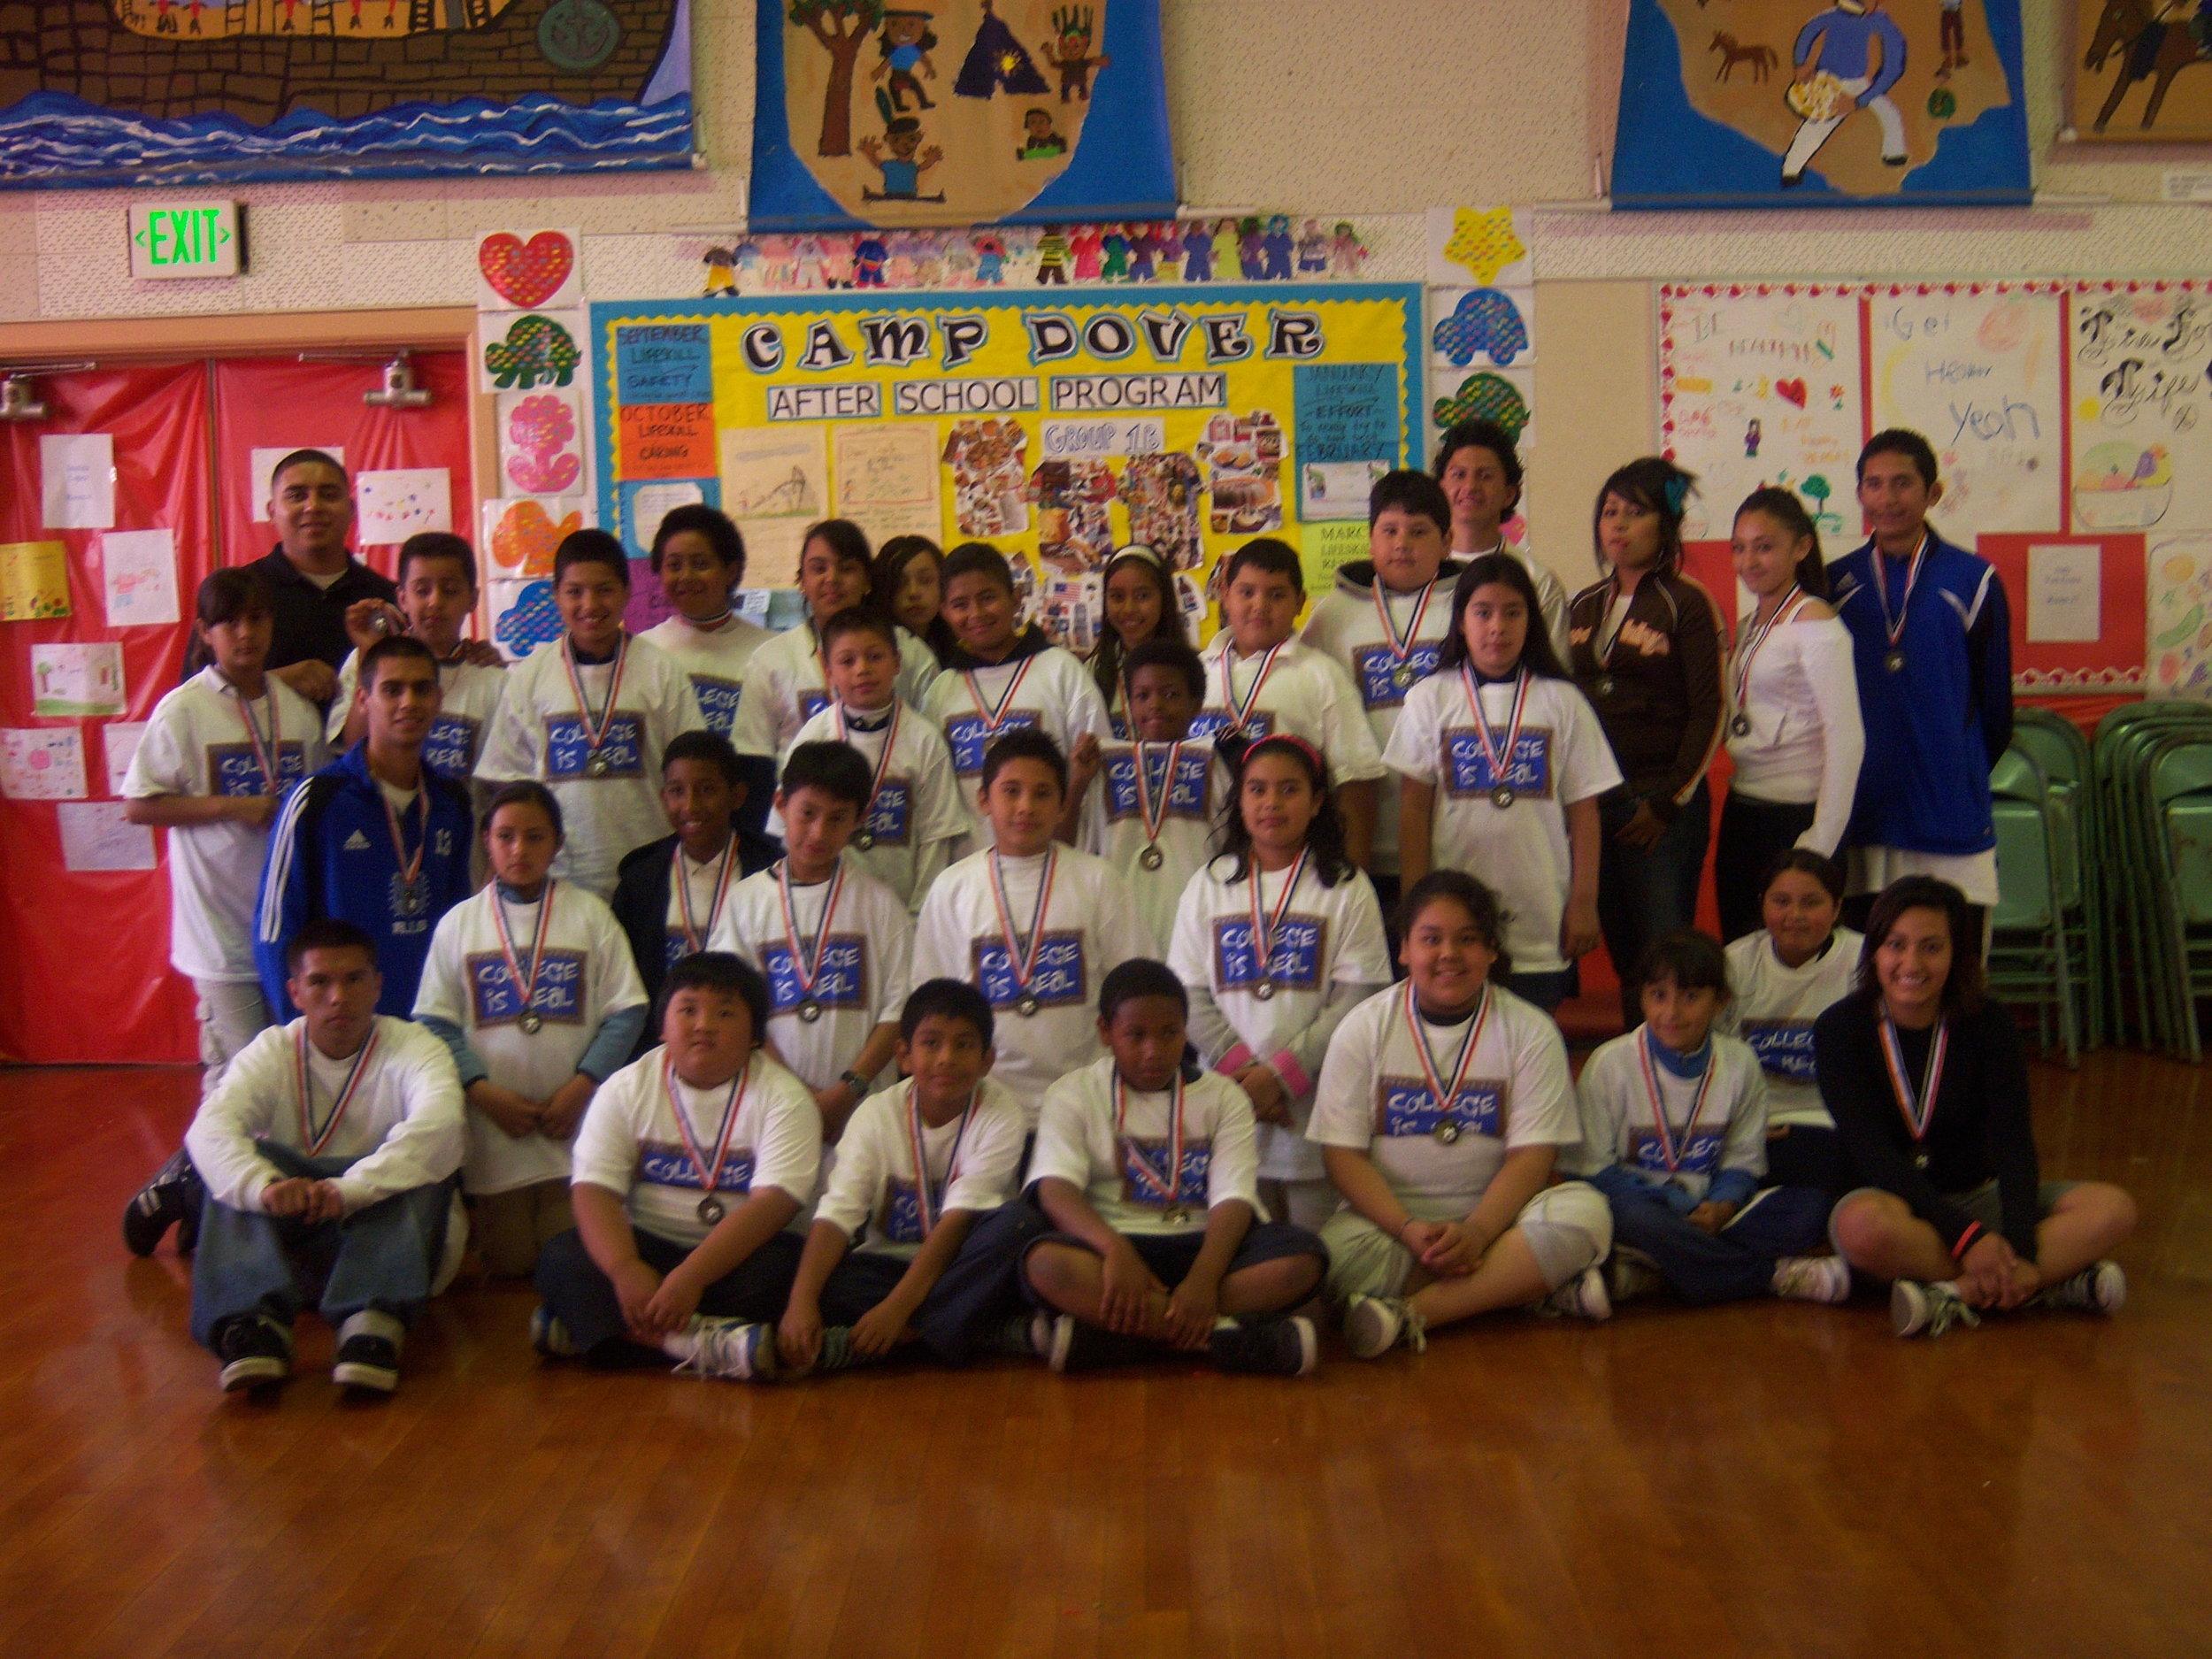 Camp Dover Group awards best.jpg